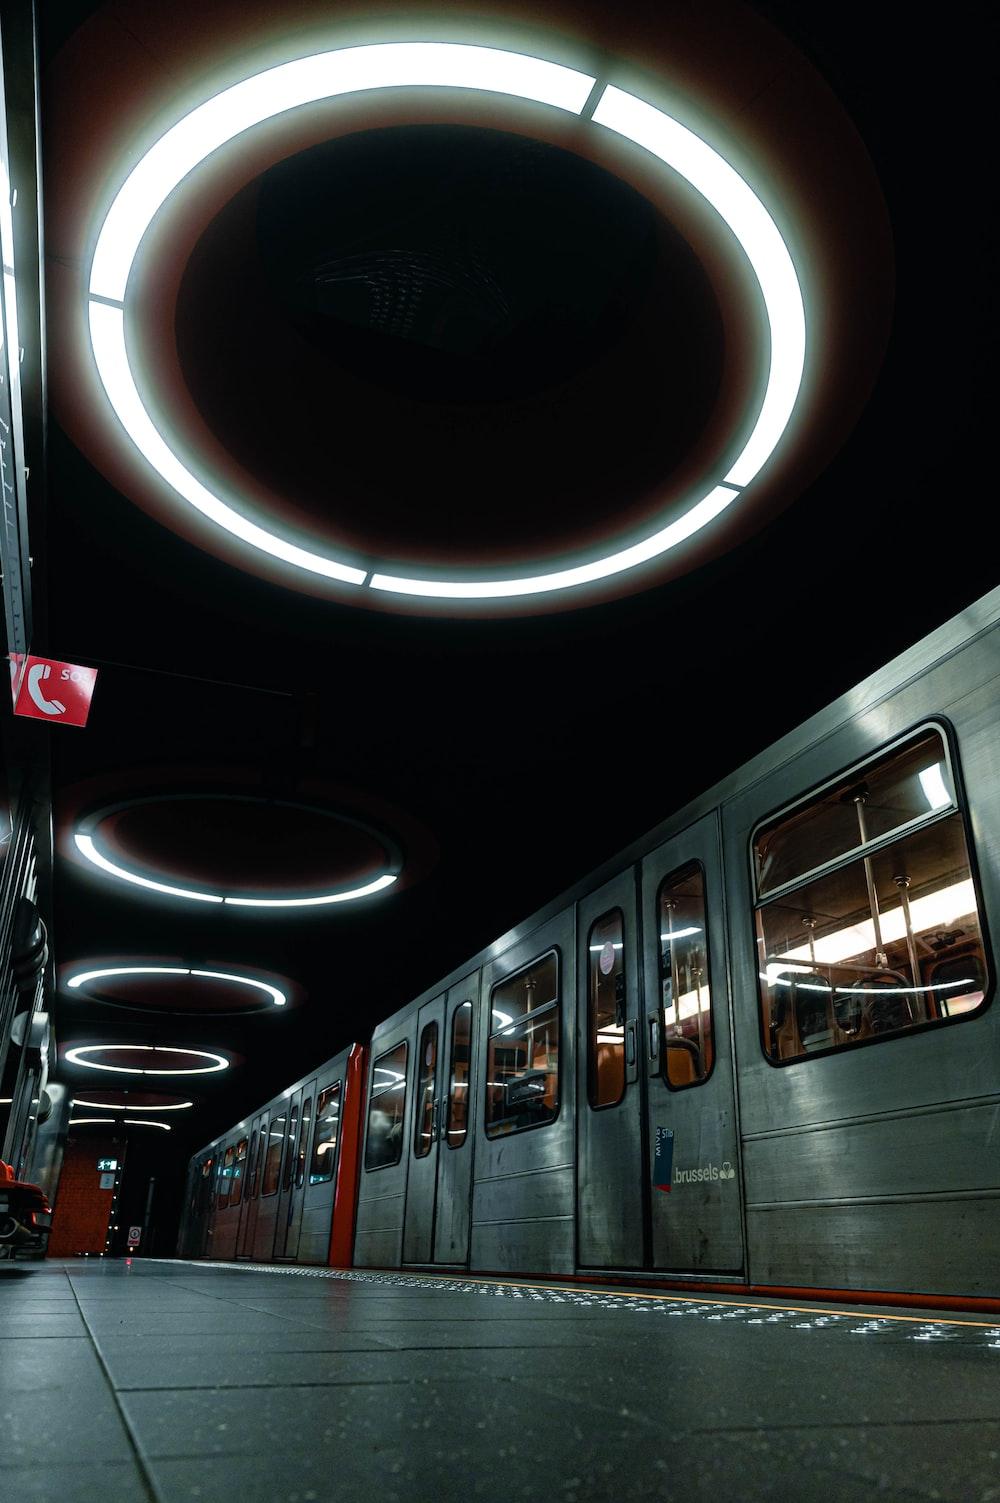 white train in a train station